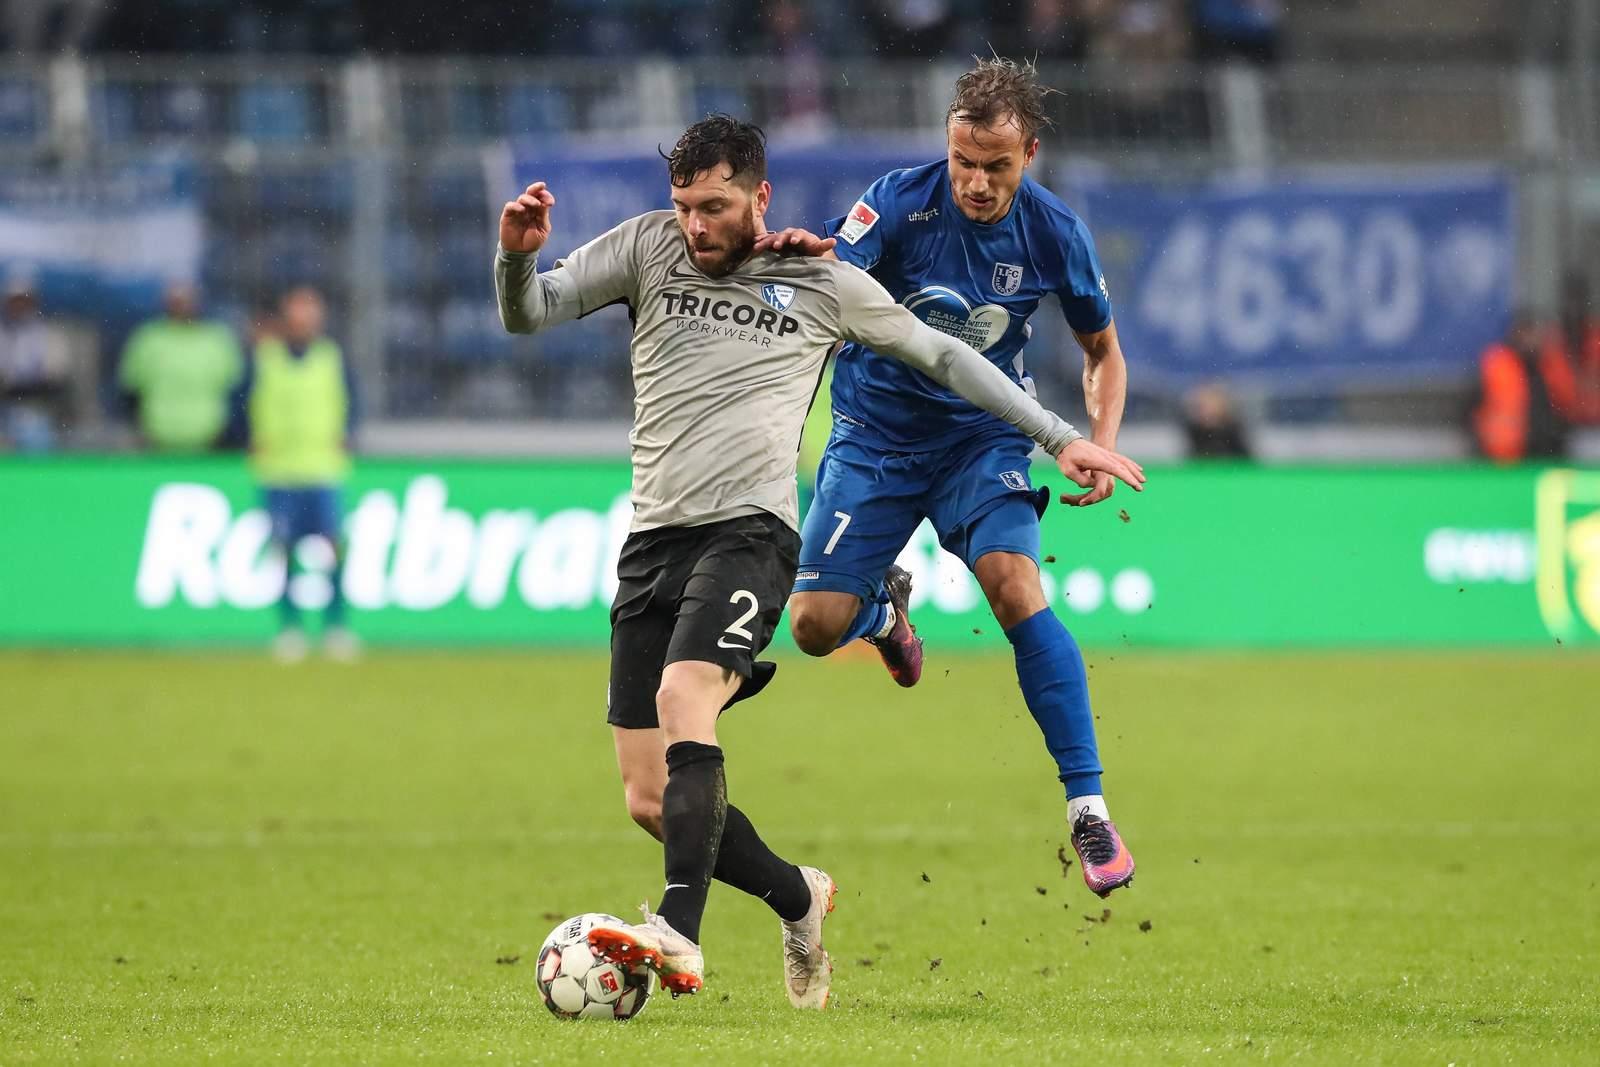 Felix Lohkemper vom 1. FC Magdeburg gegen Tim Hoogland vom VfL Bochum